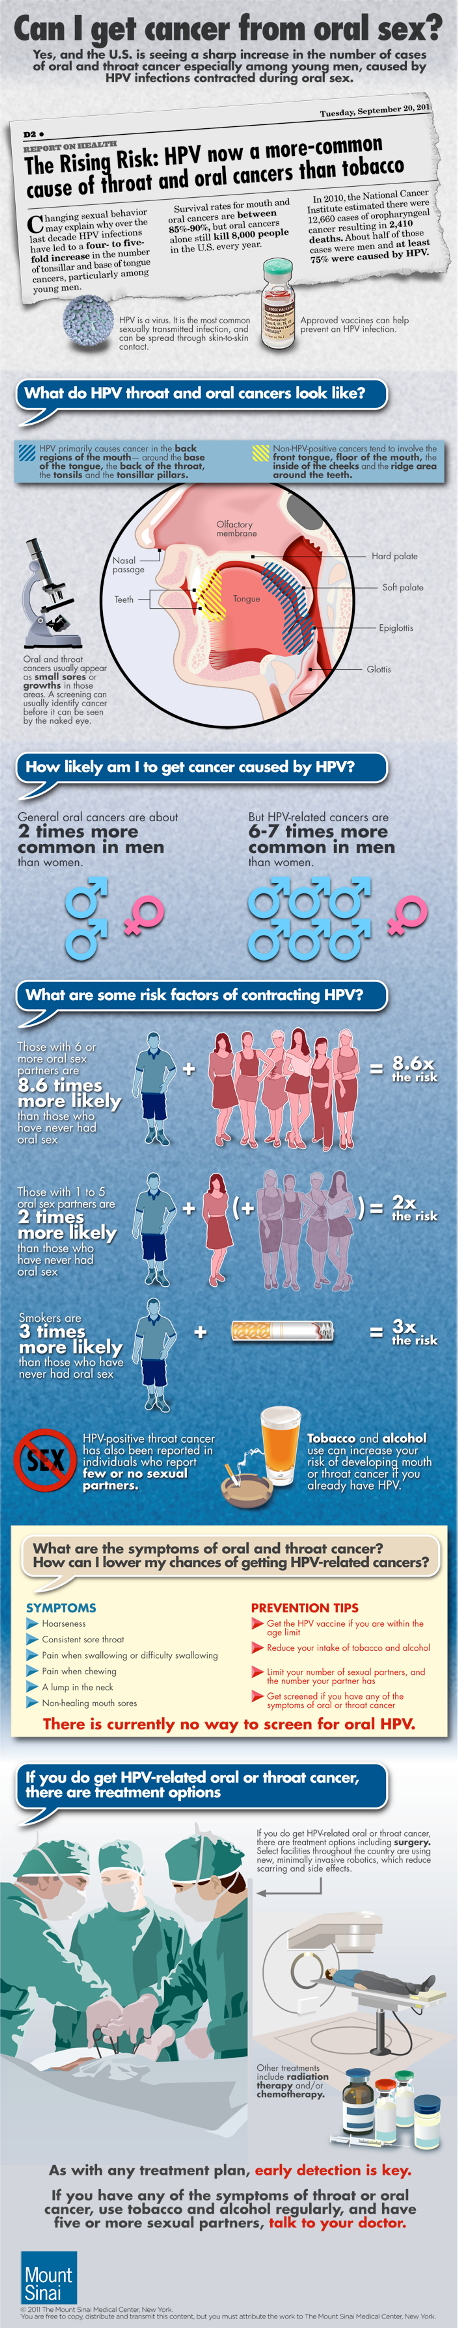 HPV-pozitív oropharyngealis rák - HPV-positive oropharyngeal cancer - gal-kuria.hu